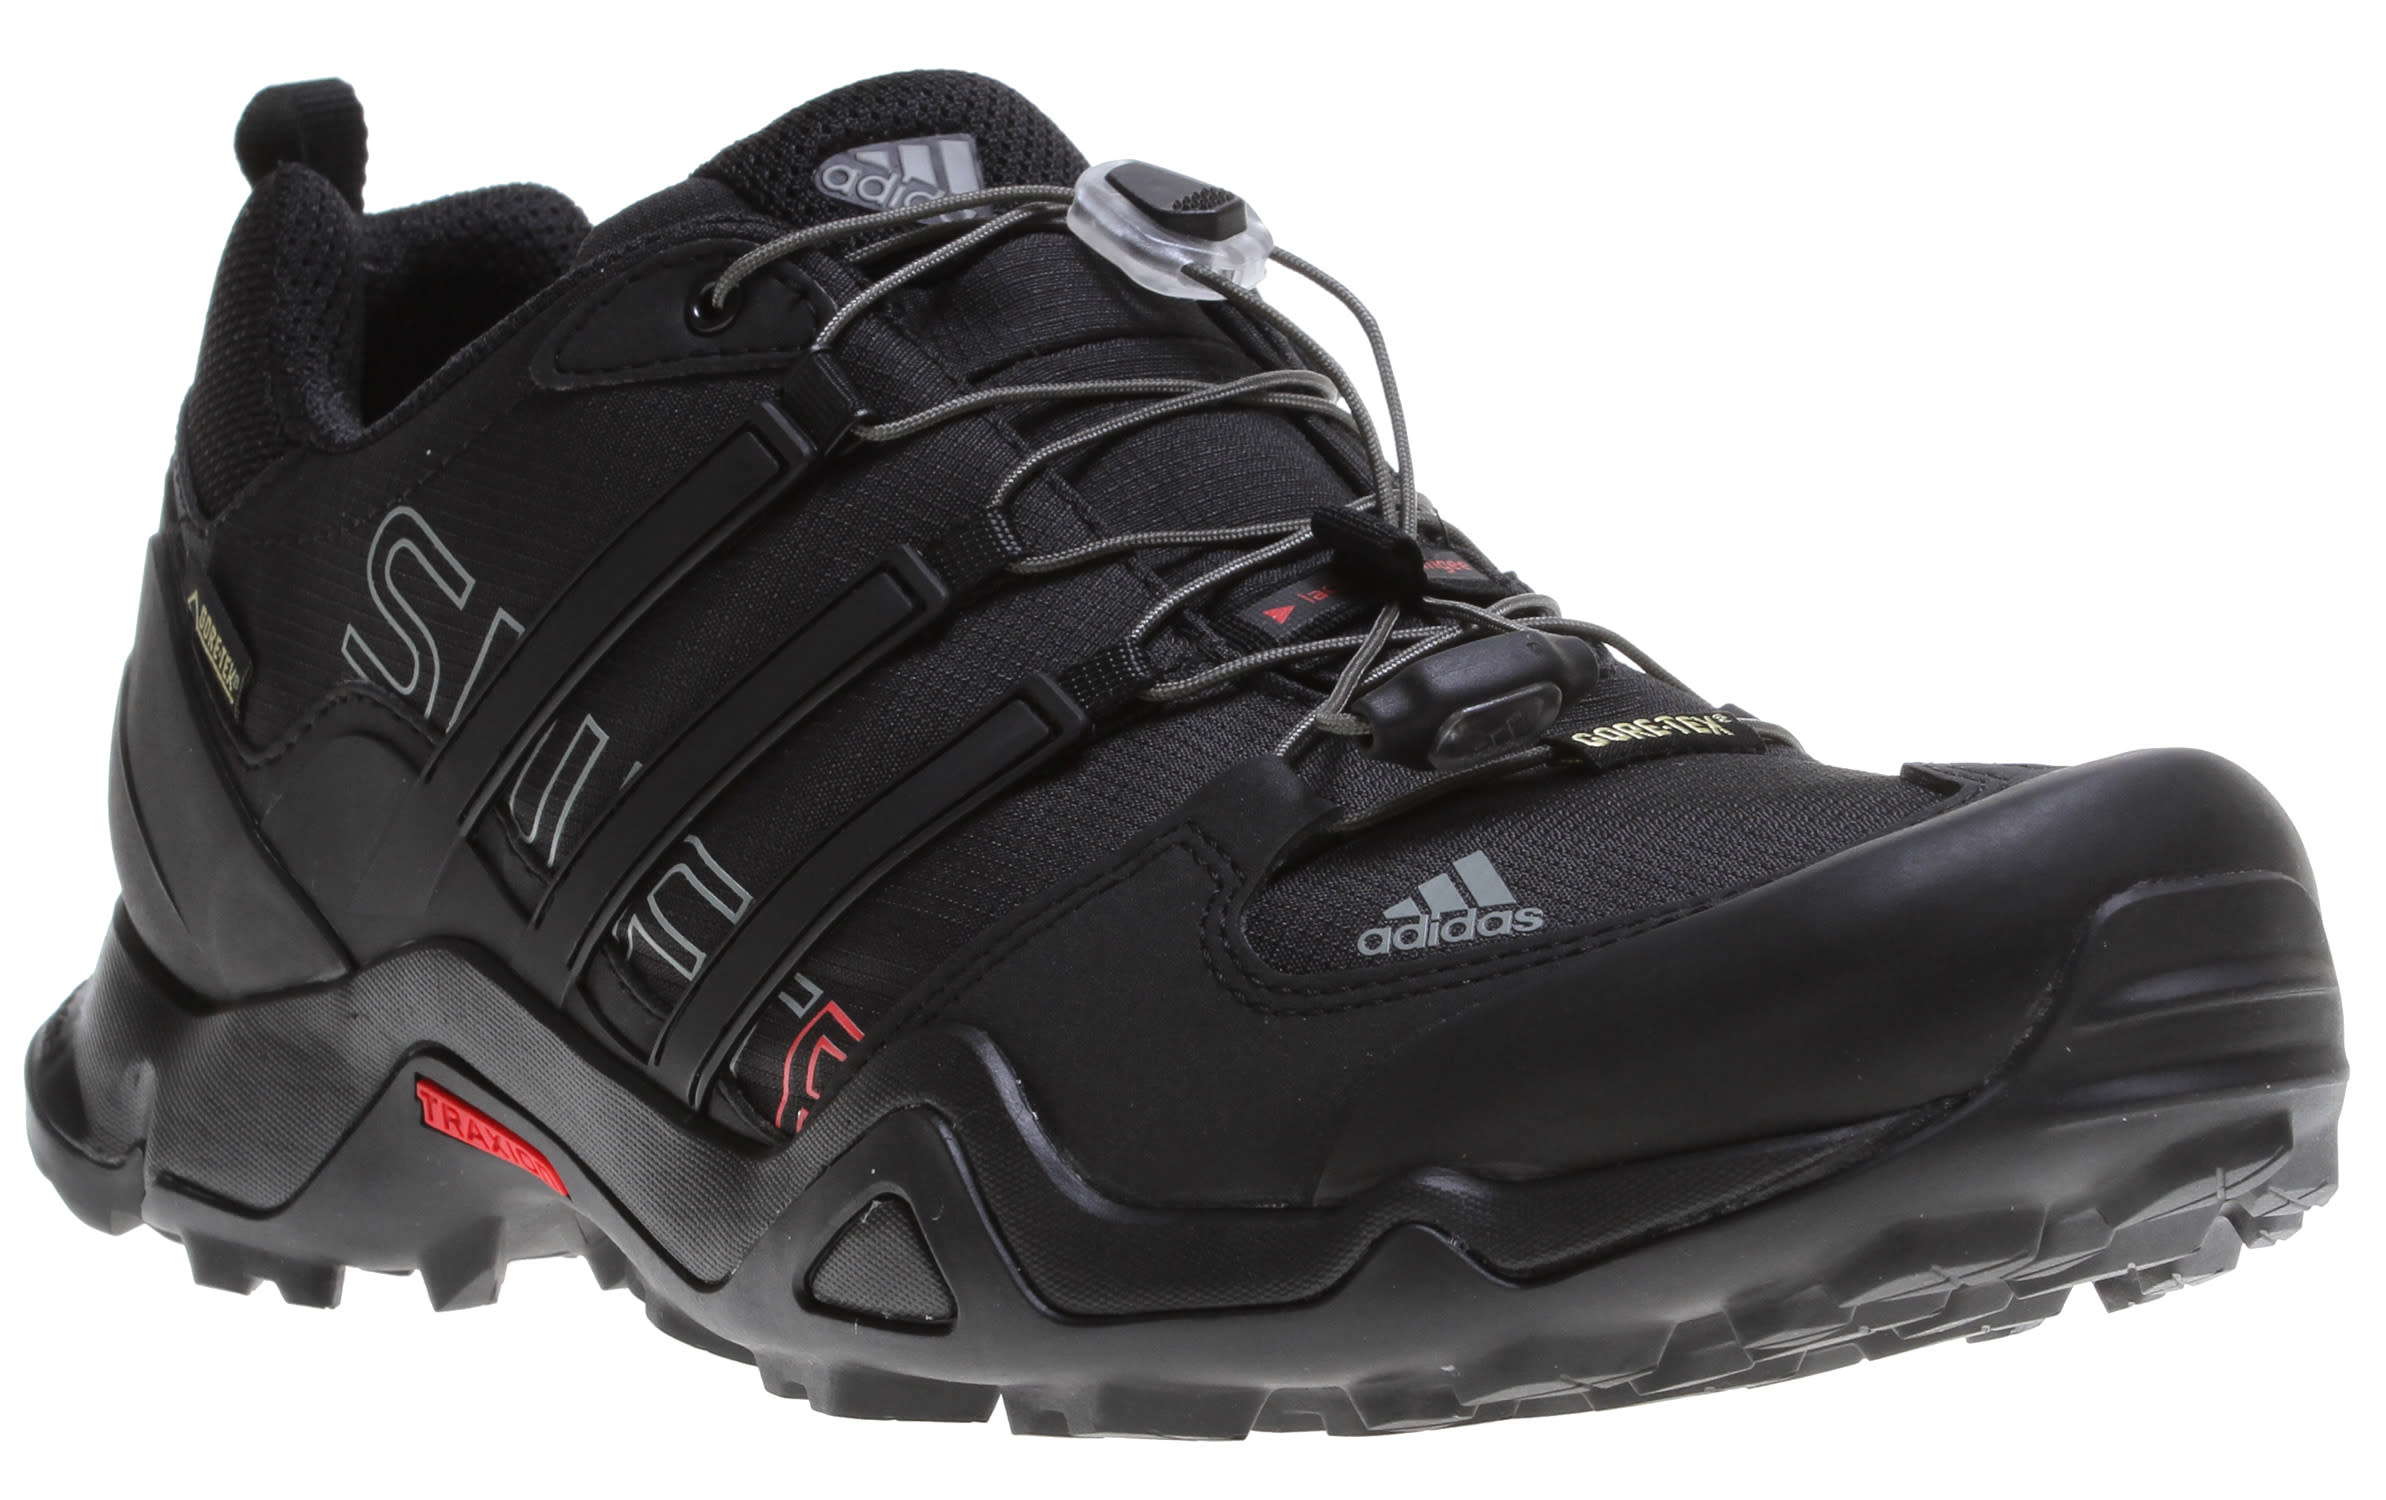 e425409095e Adidas Terrex Swift R GTX Hiking Shoes